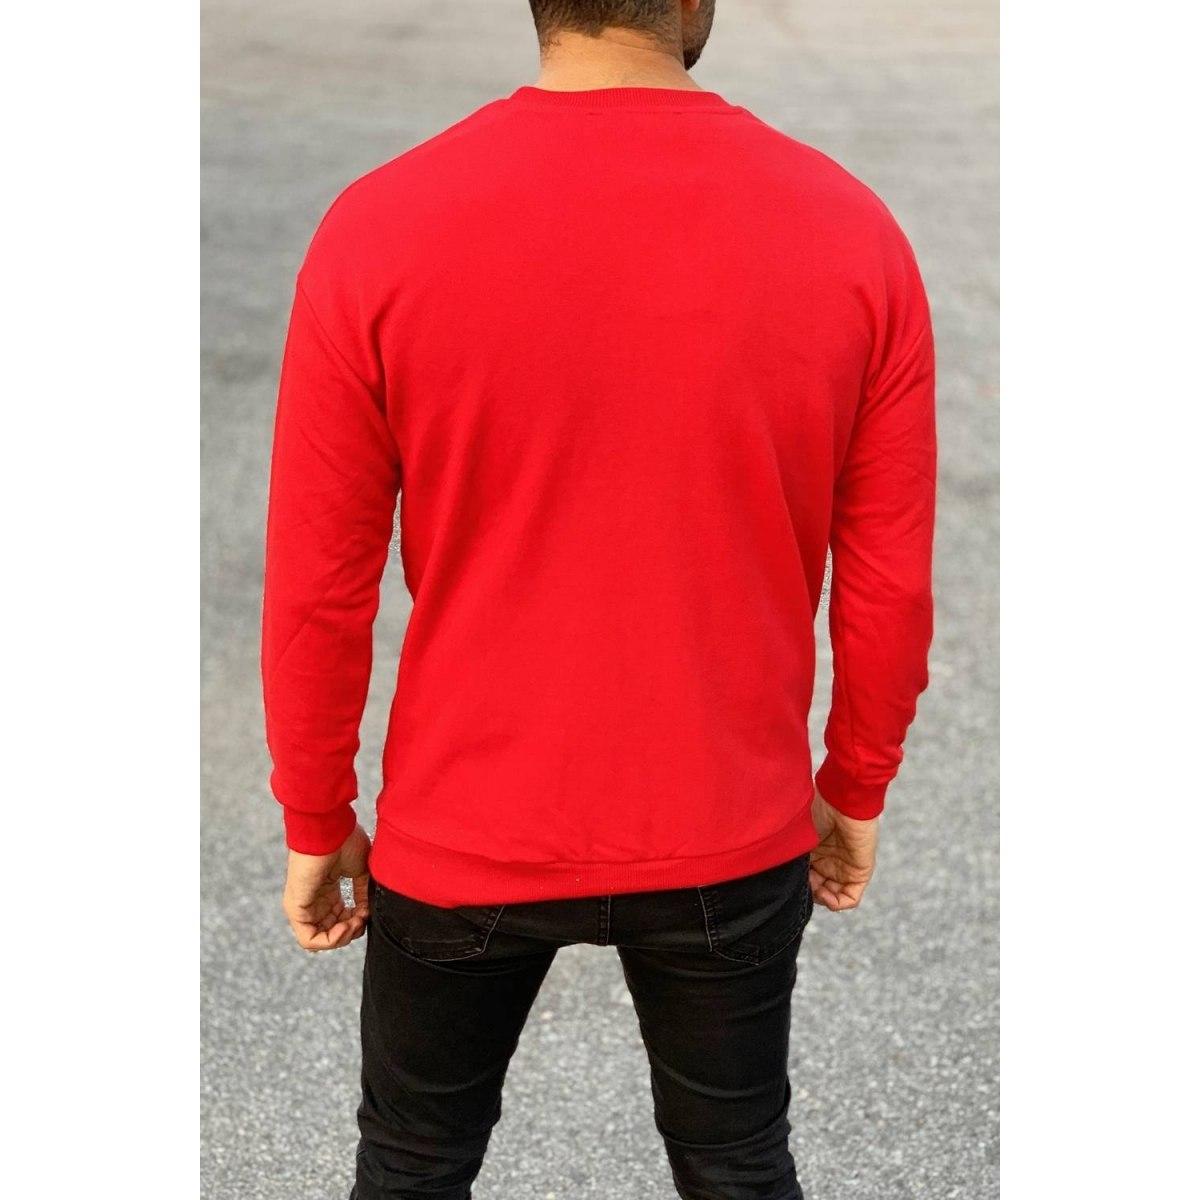 Santa Sweatshirt in Red Mv Premium Brand - 3